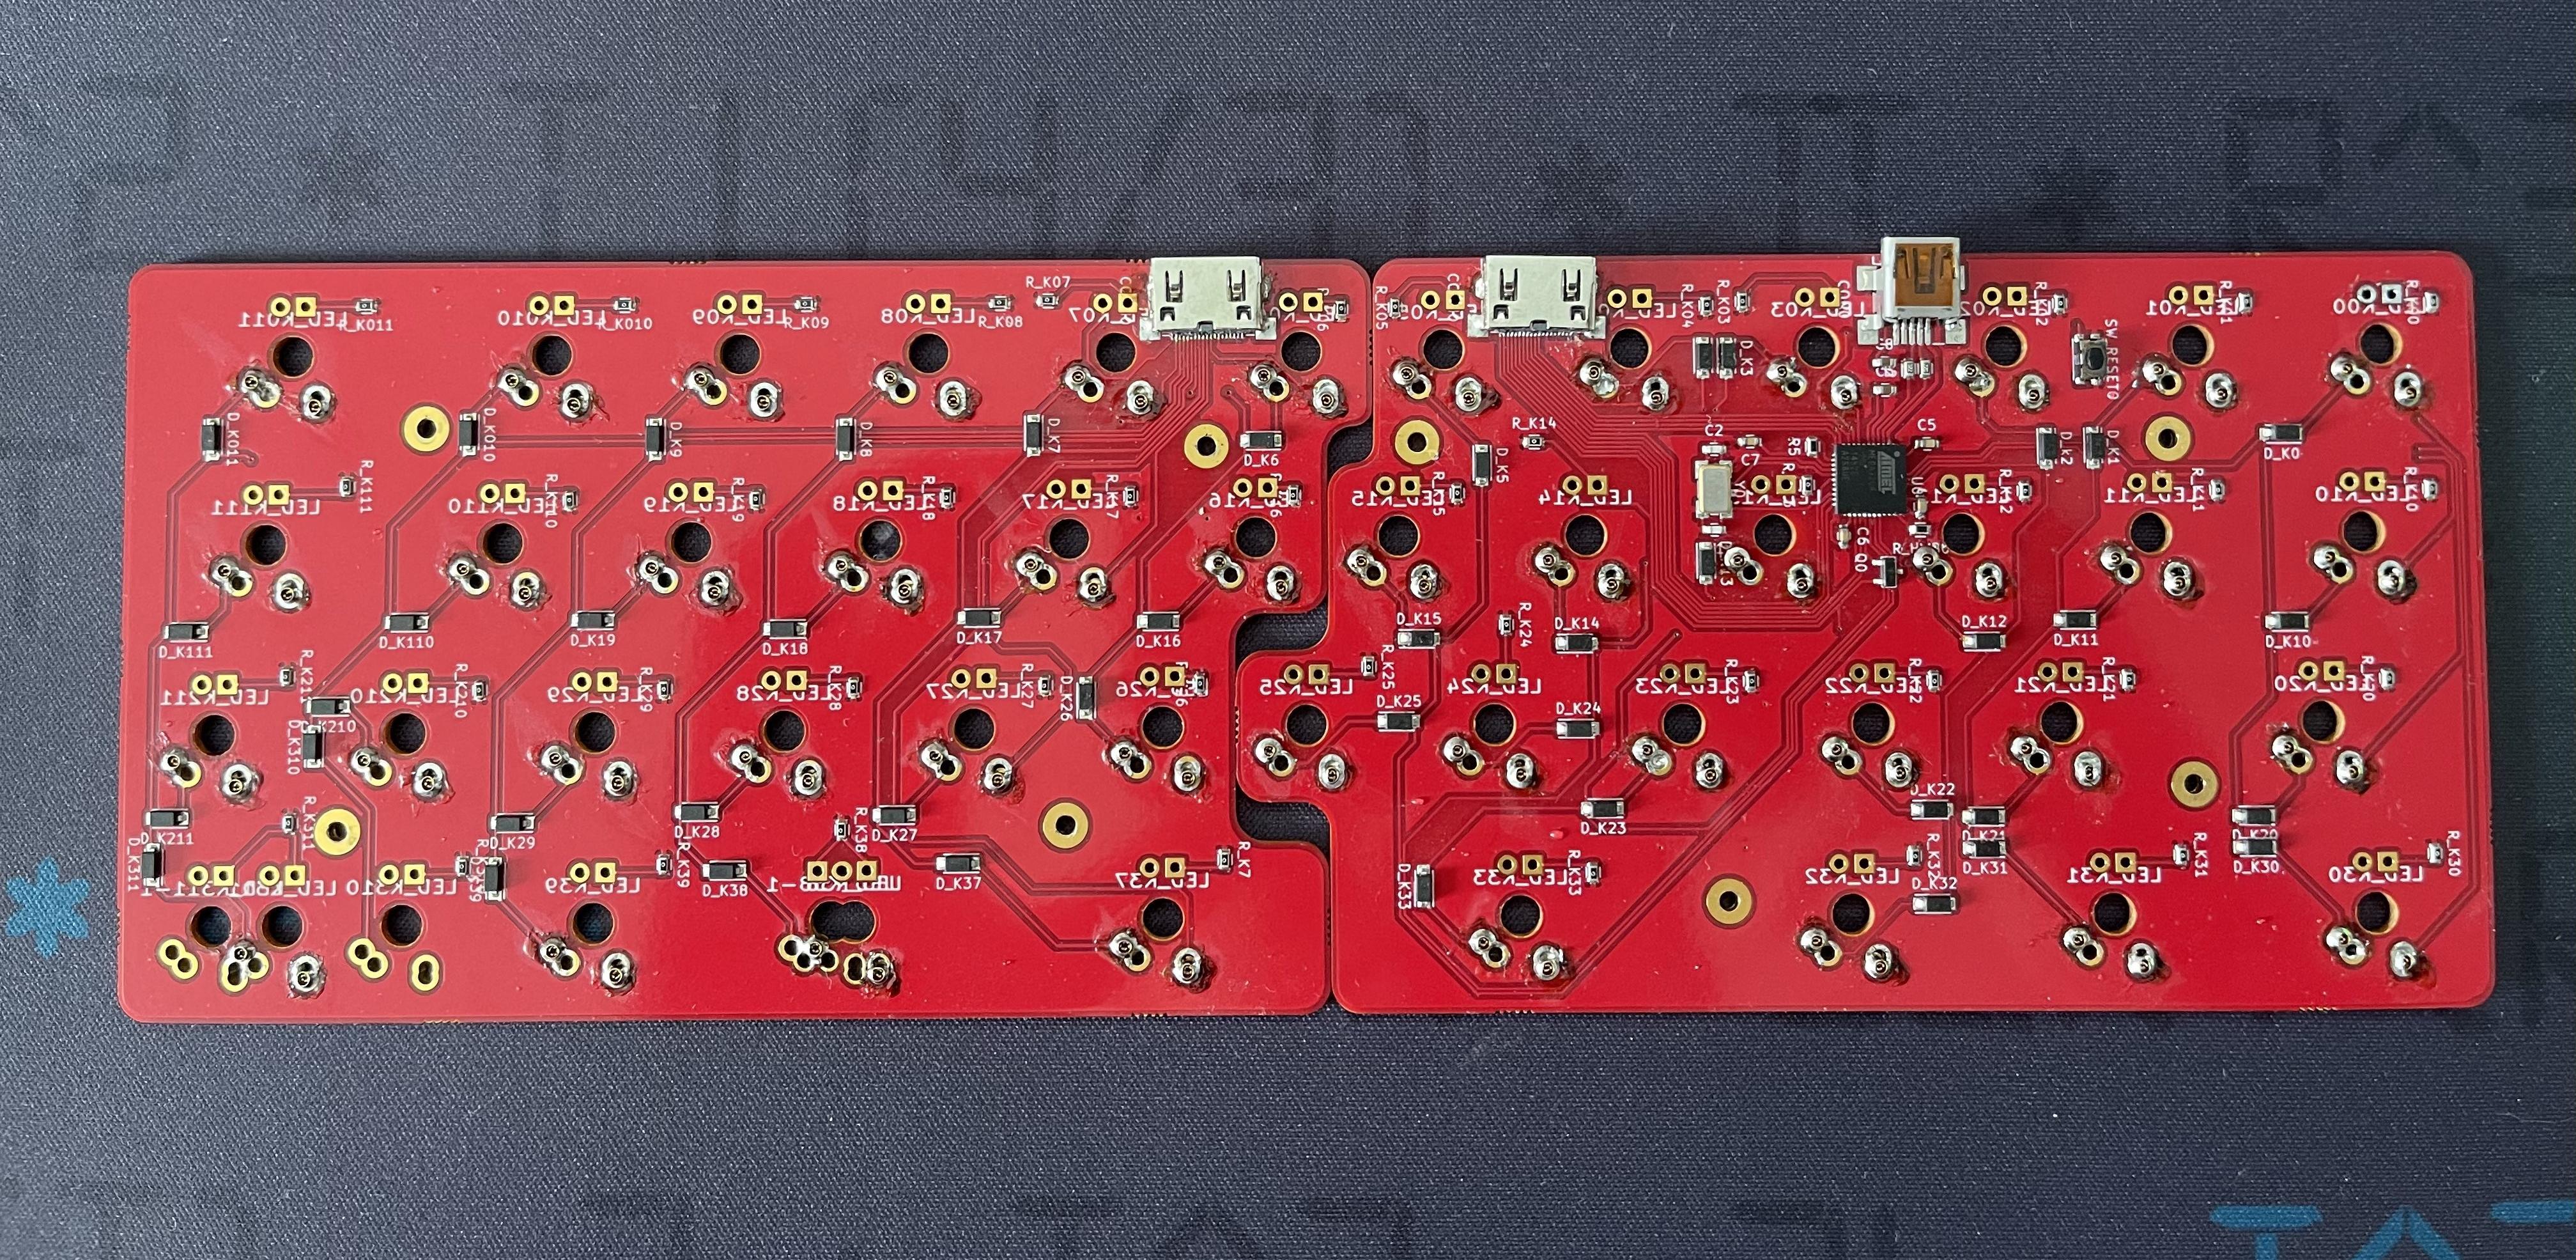 CaraVan prototype PCB back